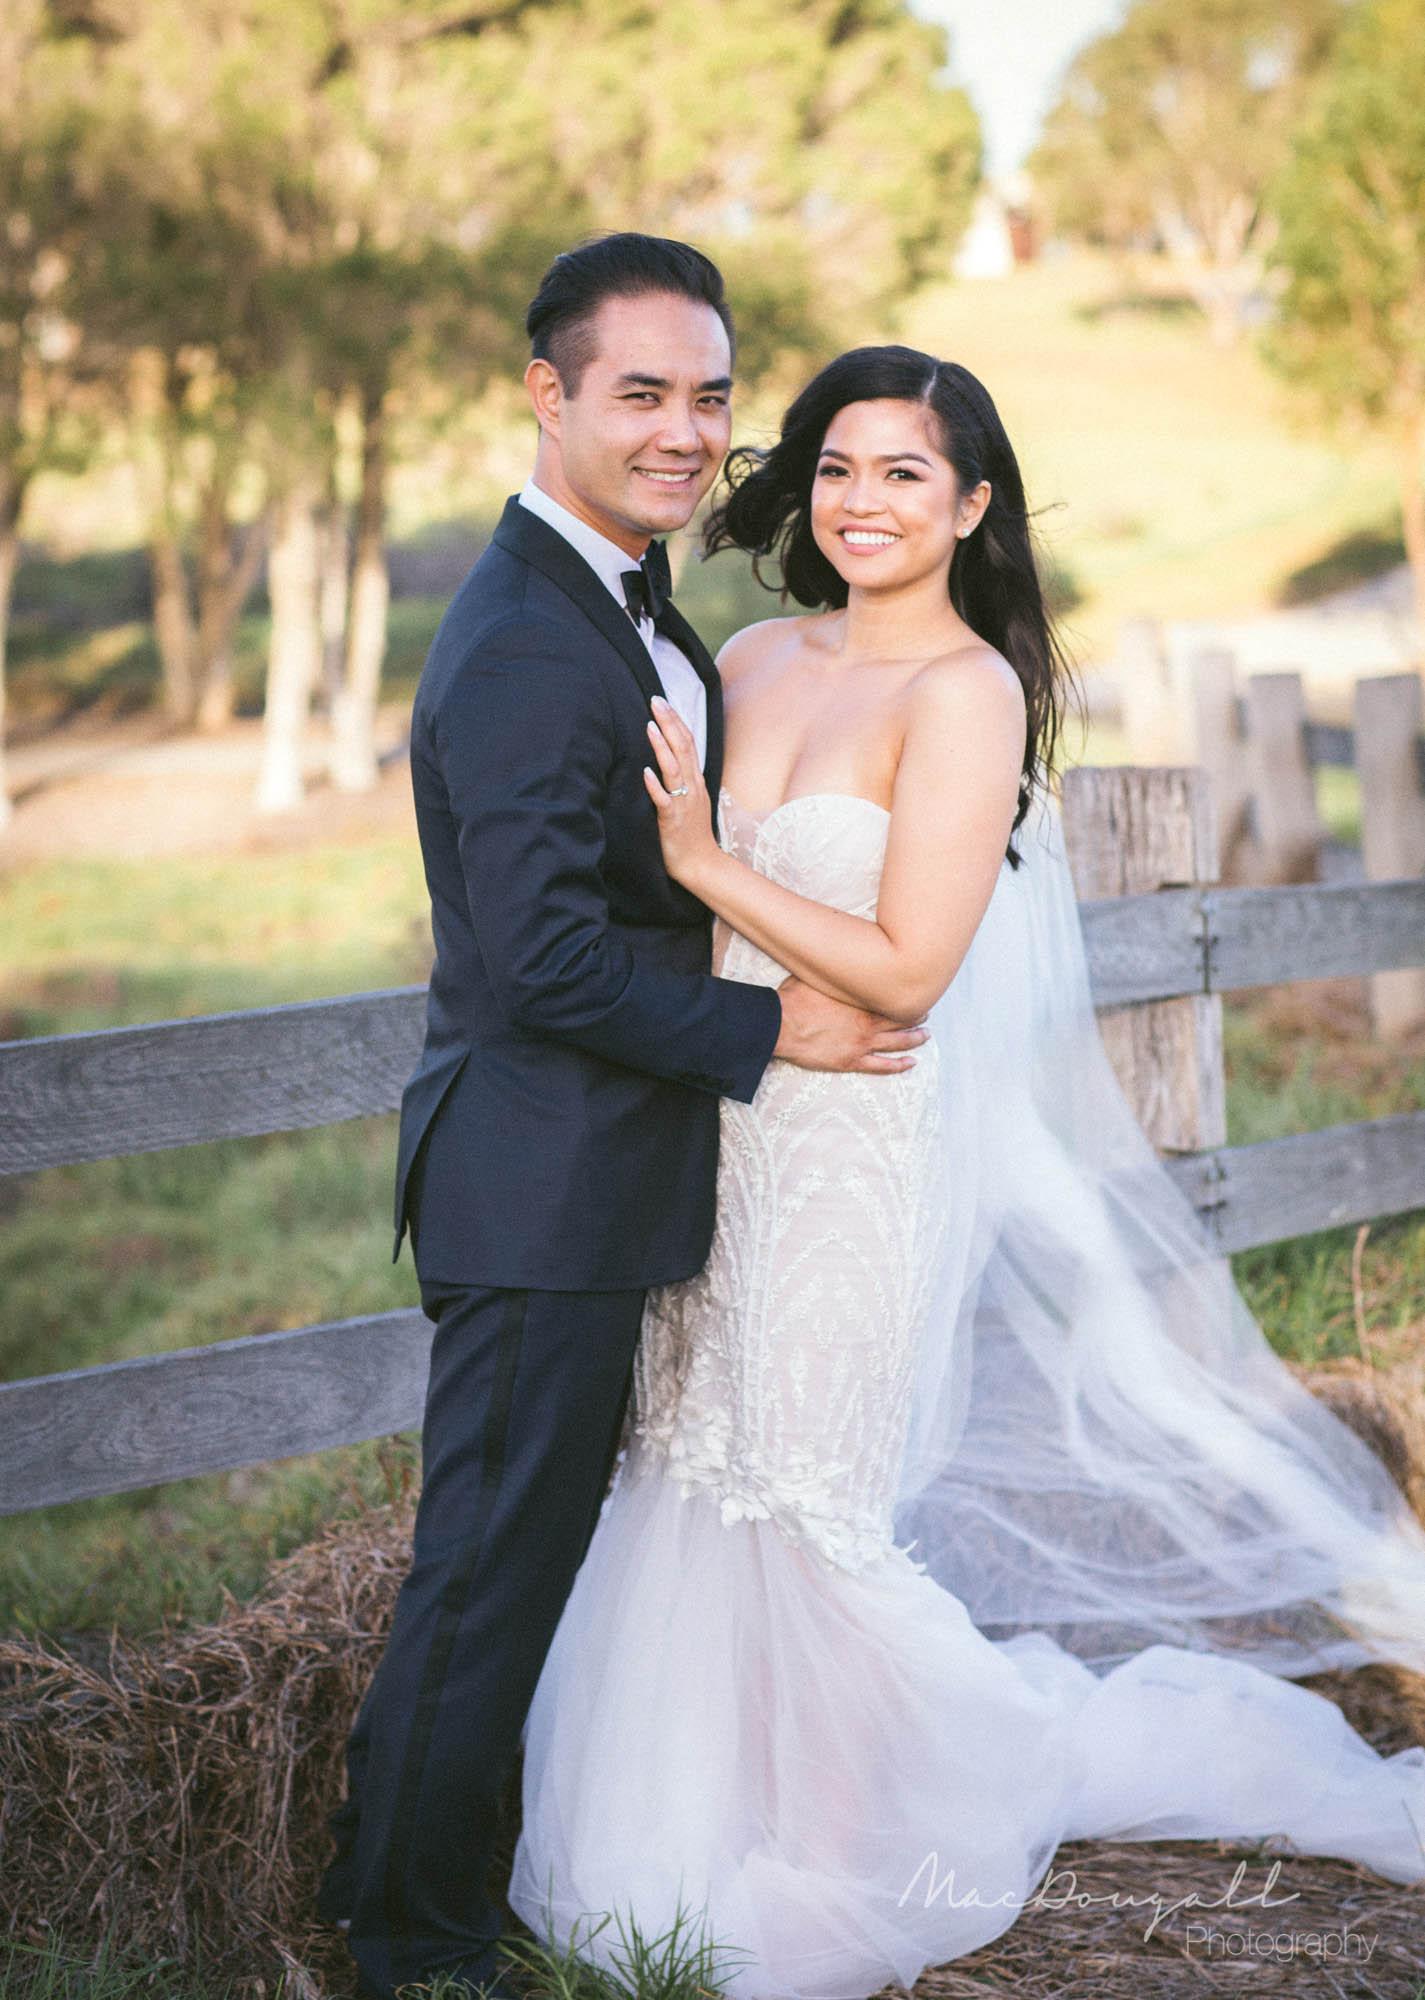 MacDougall-Photography-Sydney-Wedding-Photographers-27.jpg